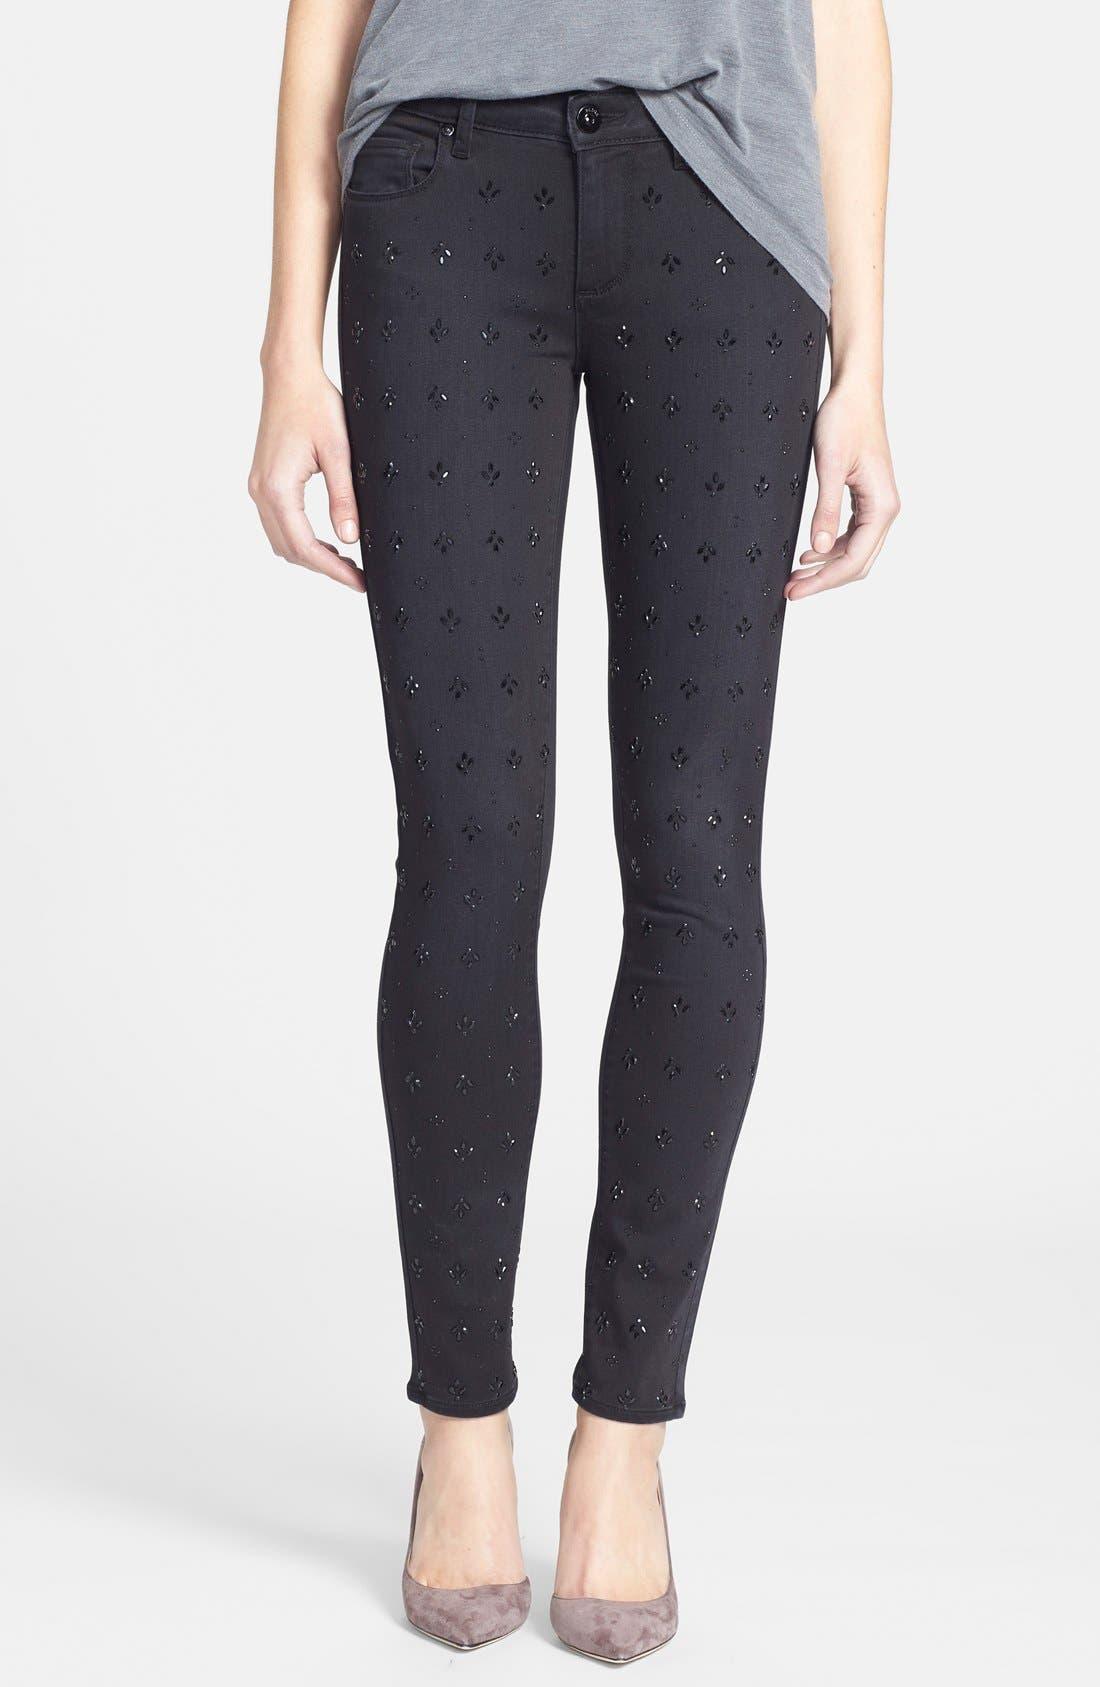 Alternate Image 1 Selected - Paige Denim 'Verdugo' Ultra Skinny Jeans (Cleo Embellished)